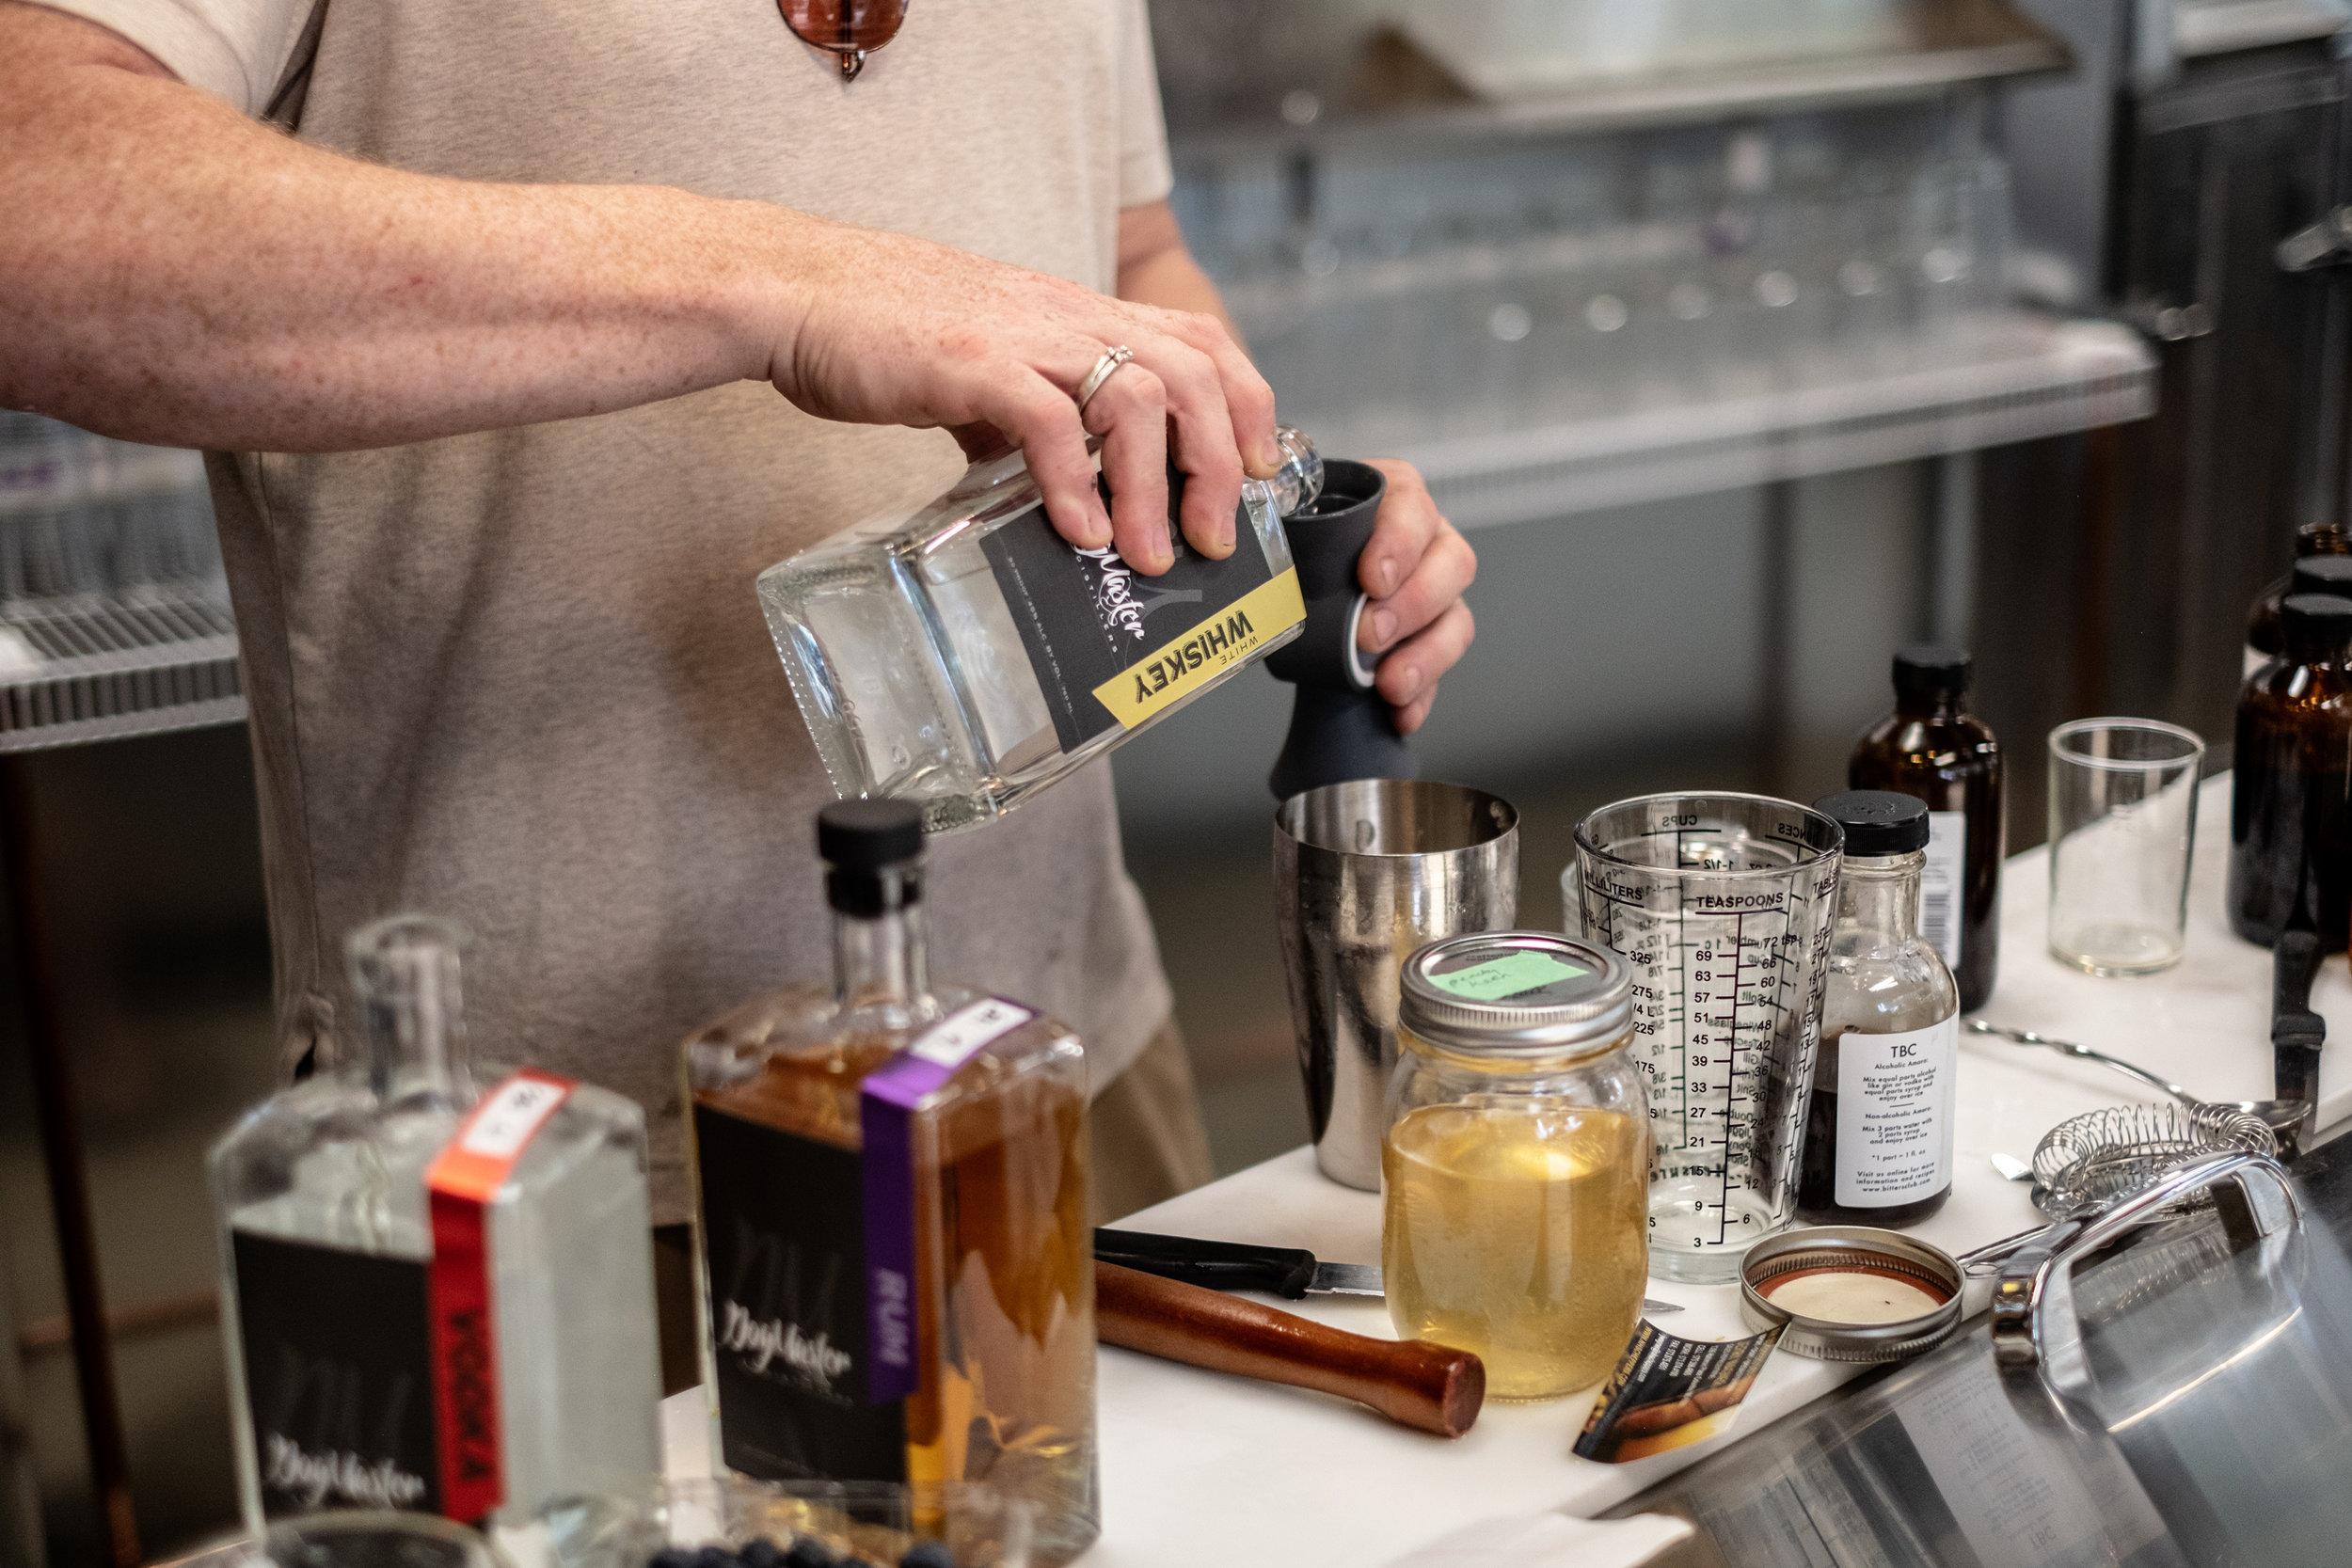 Capital-bootcamp-cocktails-drinkraft-001.jpg